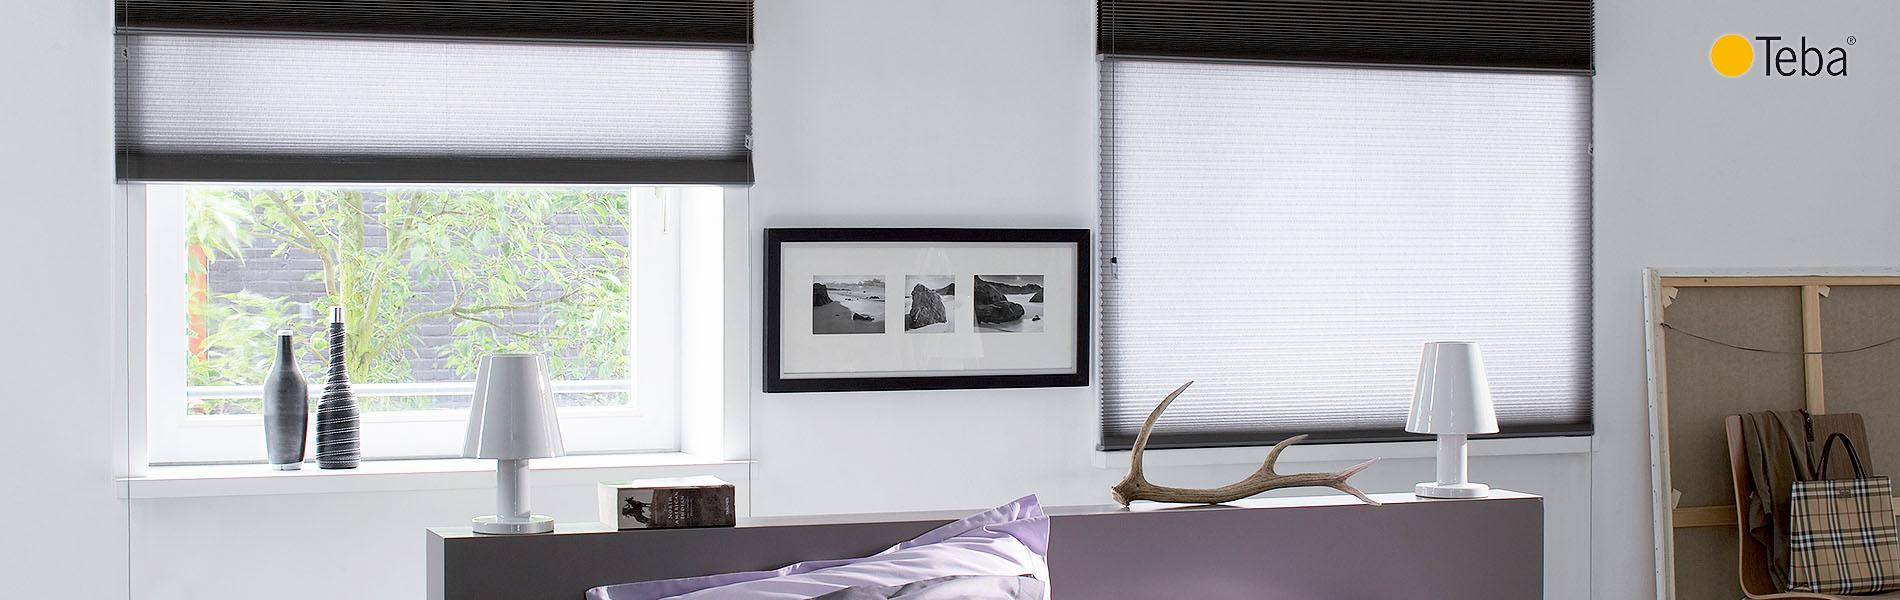 nagel raumausstatter berlin raumgestaltung. Black Bedroom Furniture Sets. Home Design Ideas